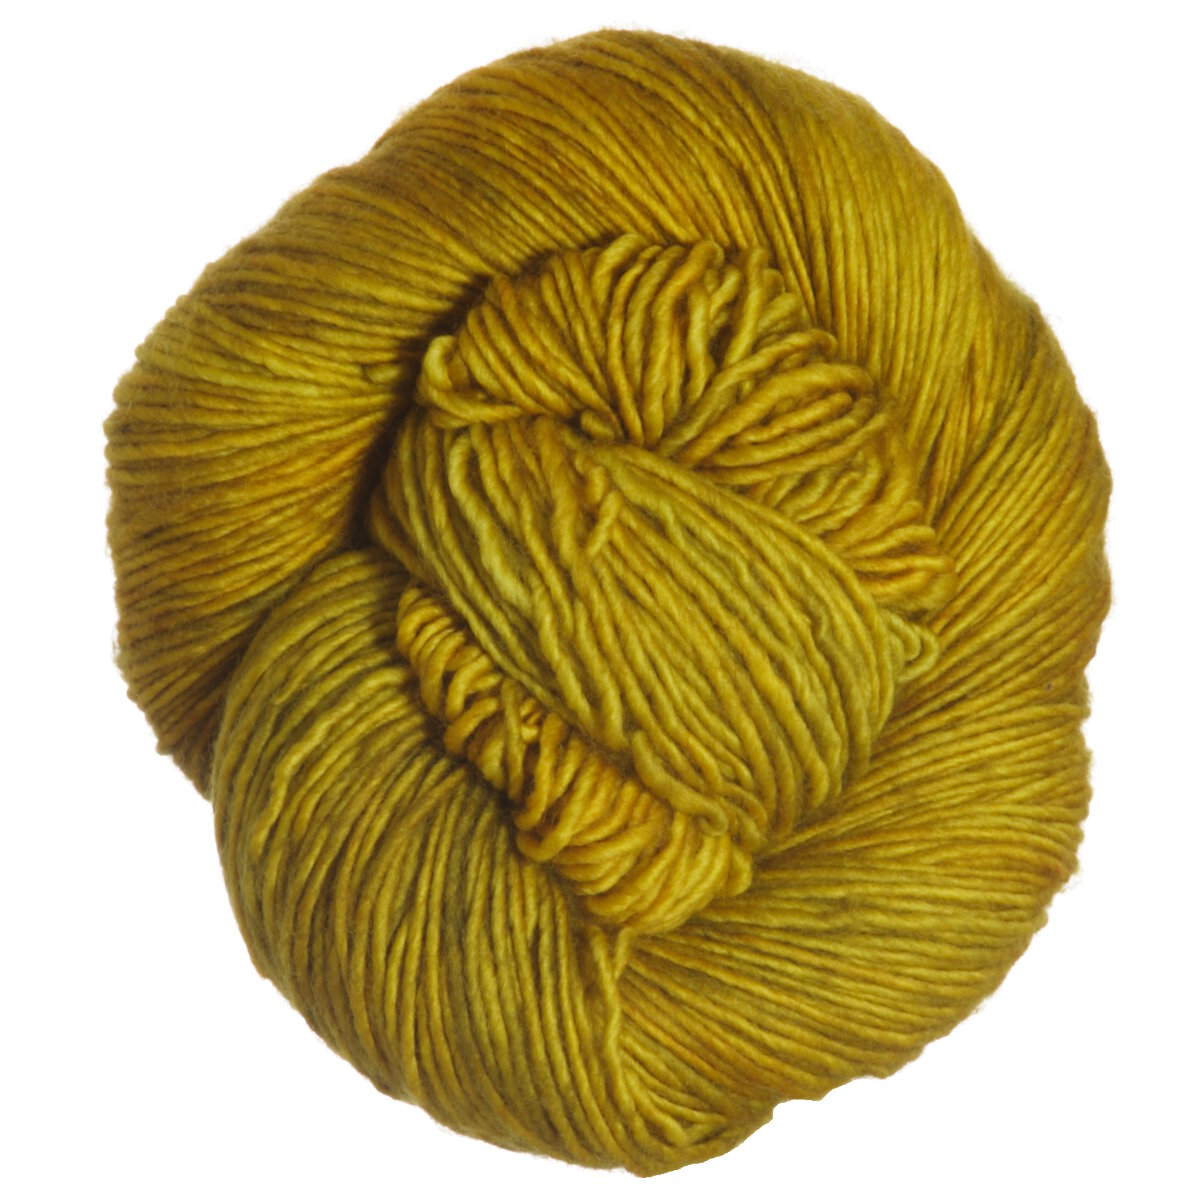 Madelinetosh Tosh Merino DK Yarn - Candlewick at Jimmy Beans Wool